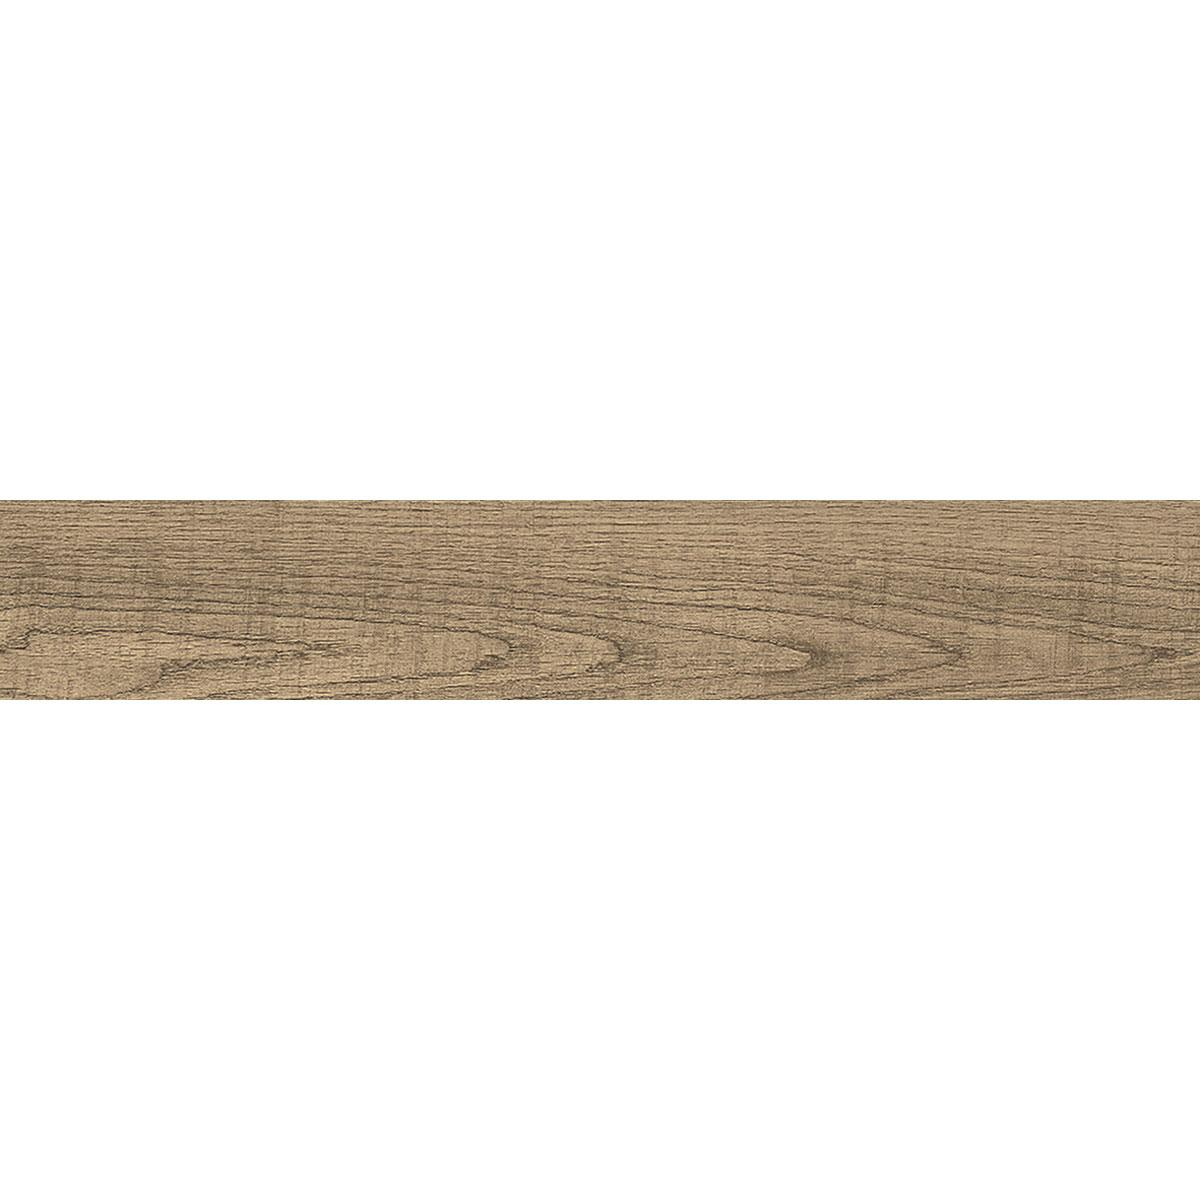 Керамогранит КИП КЕРАМИКА FOREST структур РОМЕО бежевый арт.(410428)